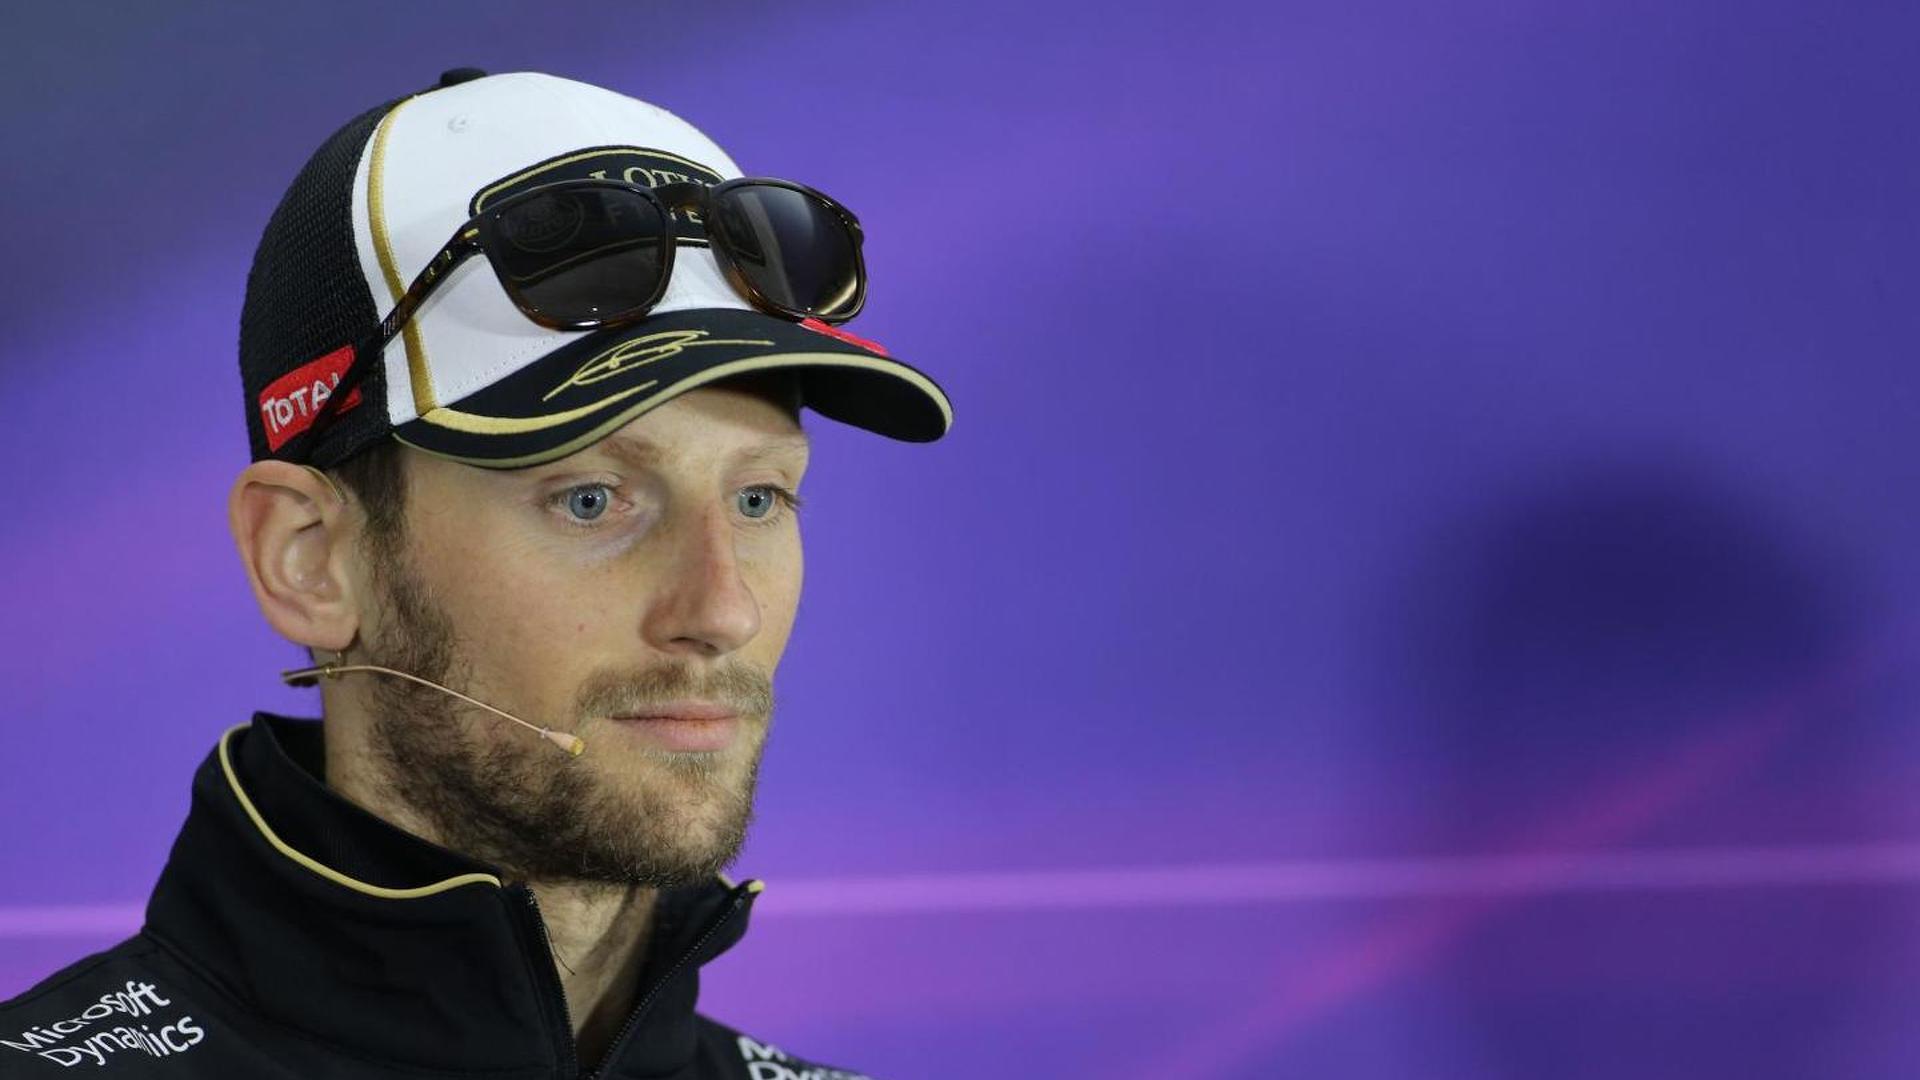 Palmer at Lotus to 'finance team budget' - Grosjean